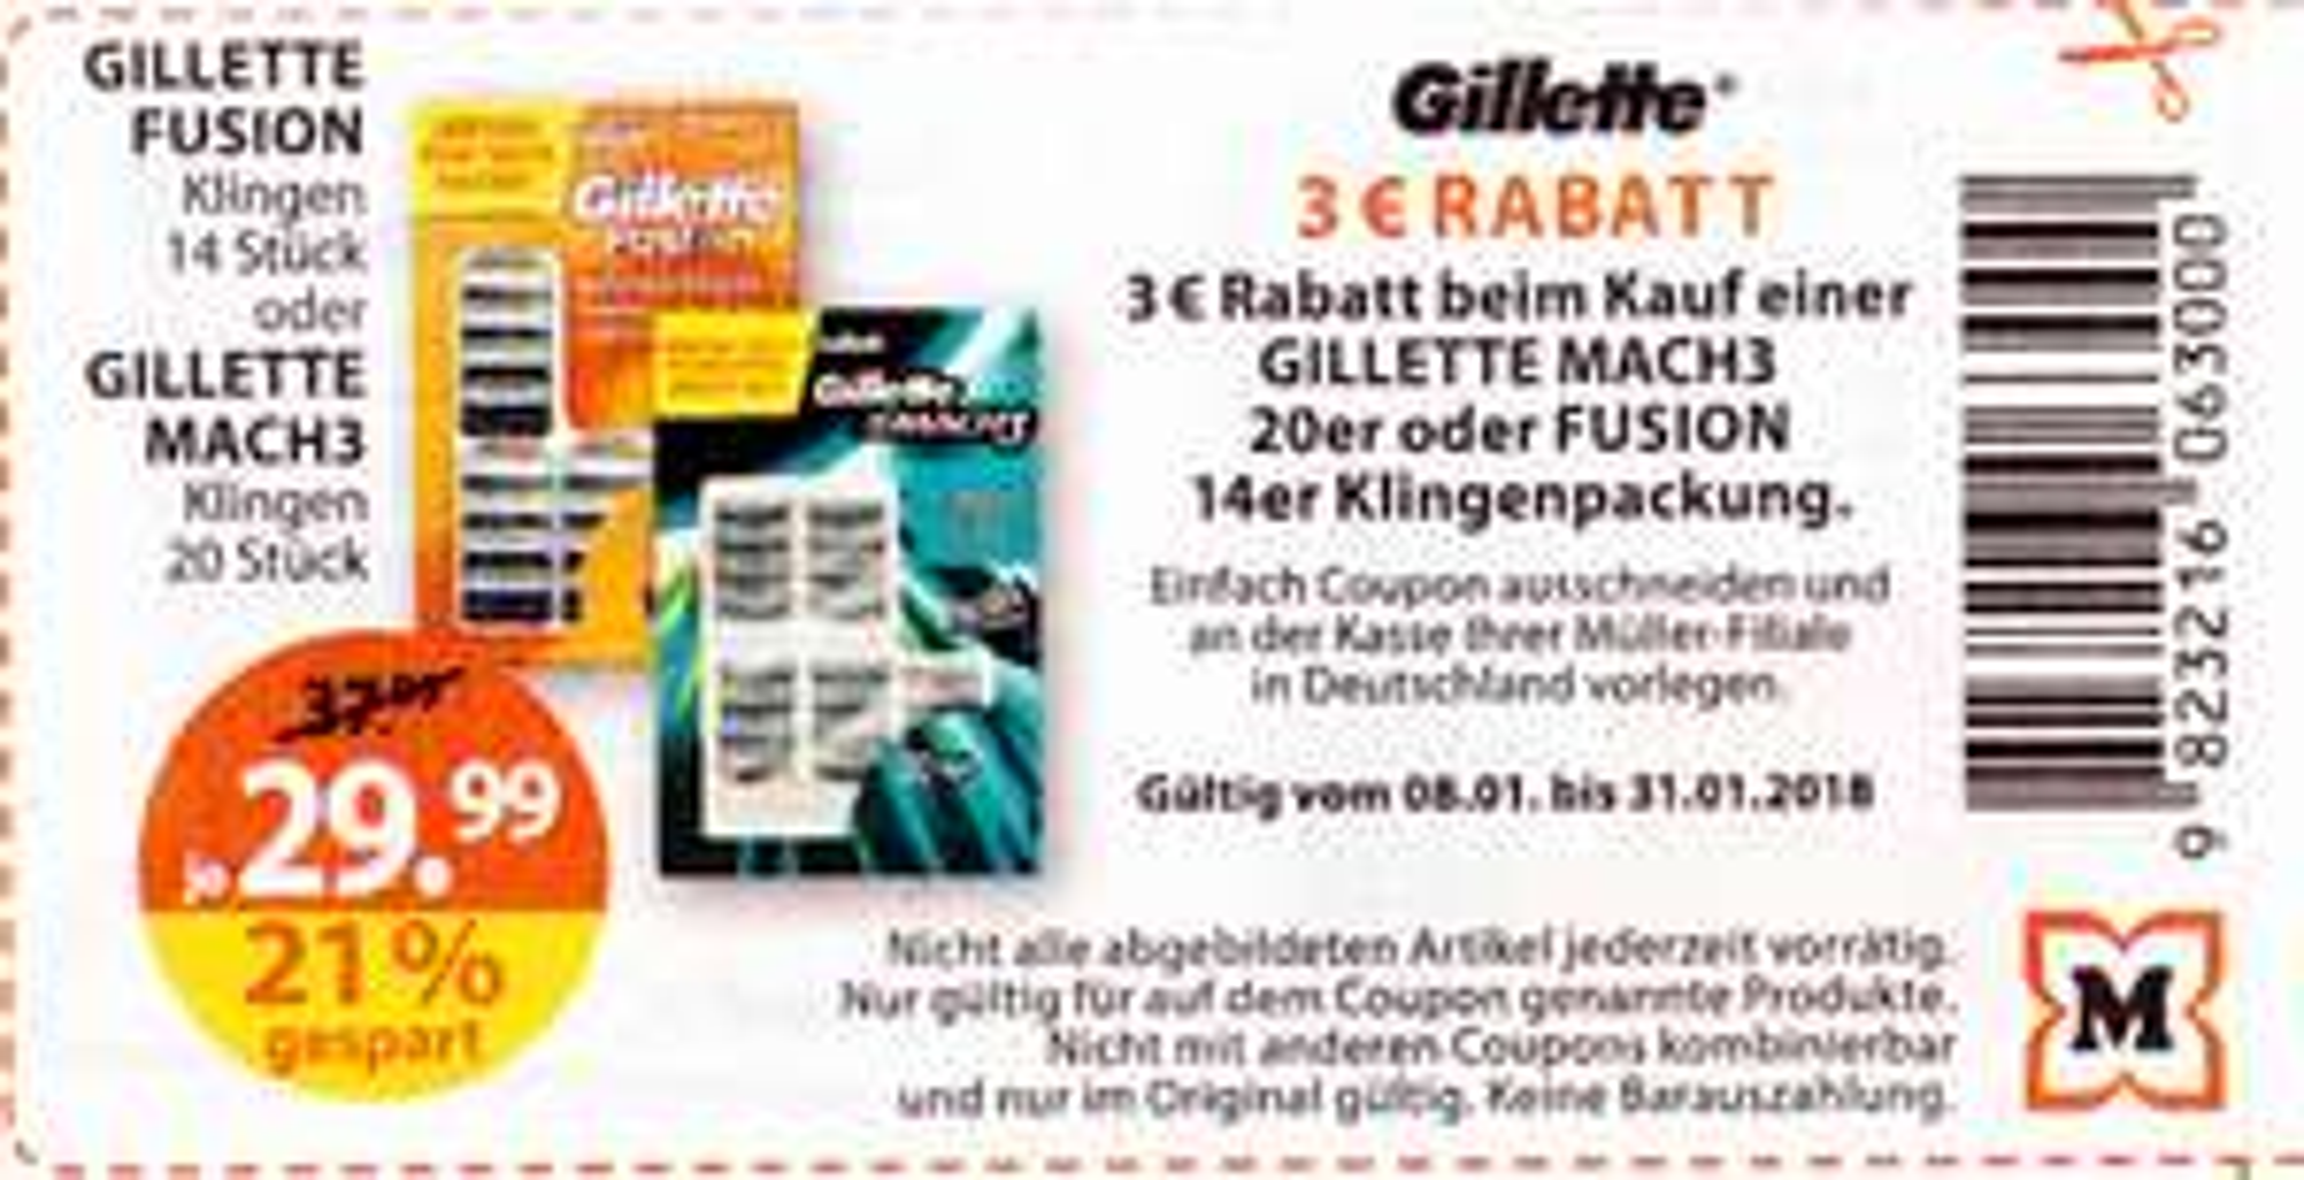 Rossmann / Müller - 3 Euro Coupon - Gillette MACH3 Rasierklingen 20er / Fusion 14er